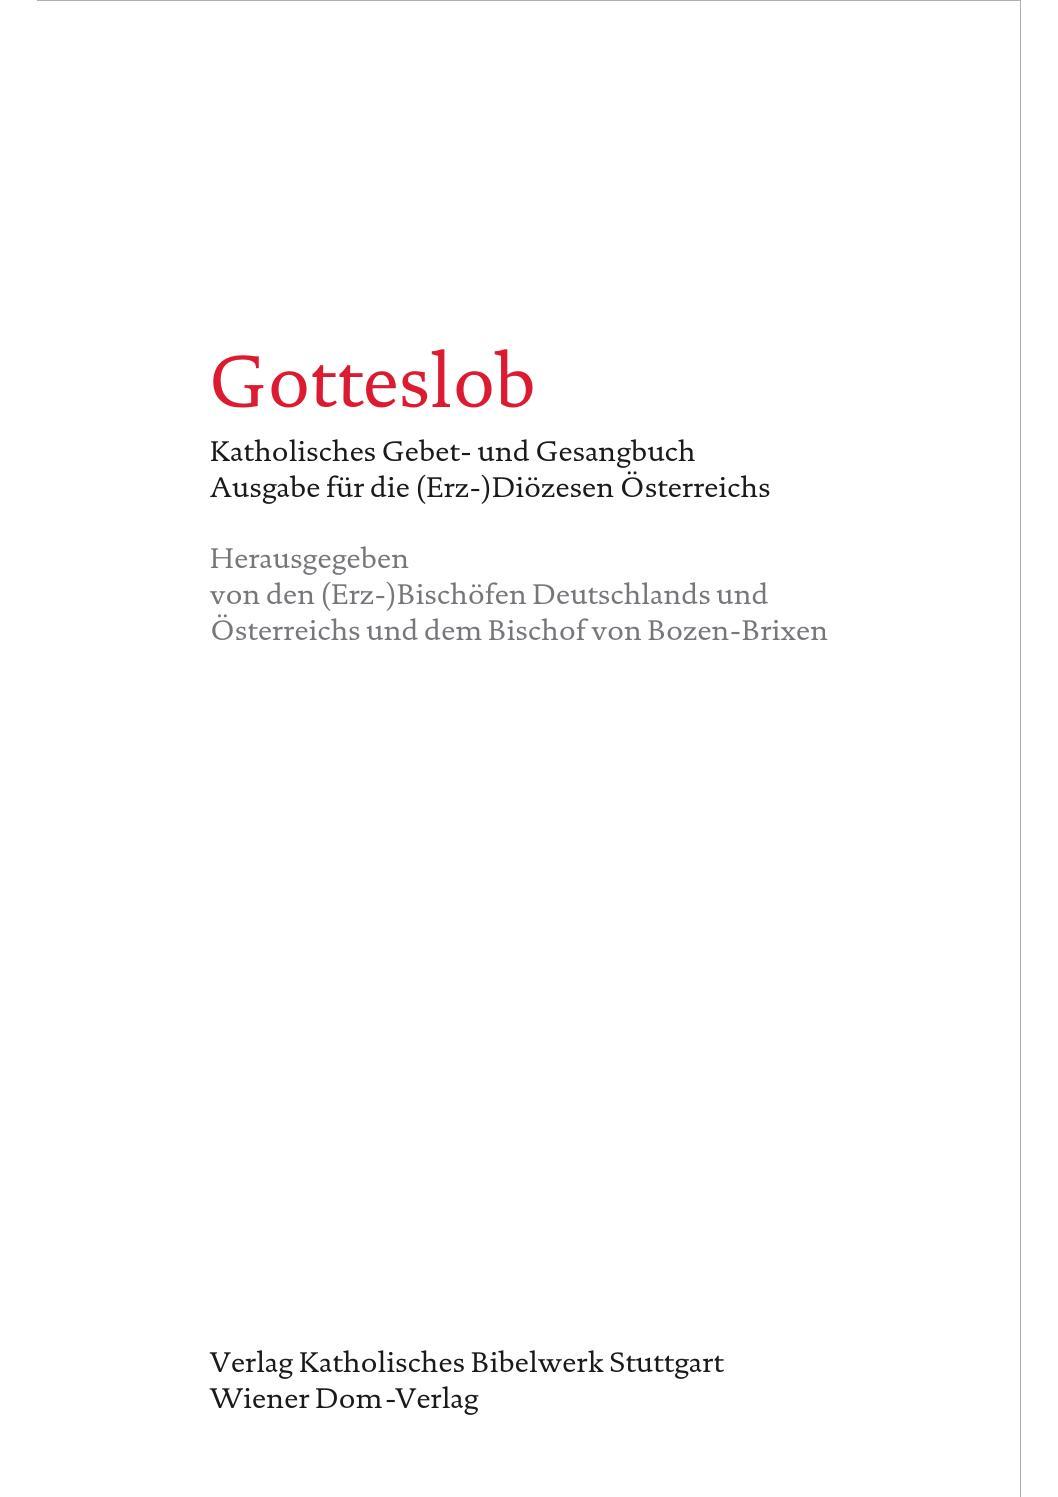 Katholisches gesangbuch gotteslob online dating